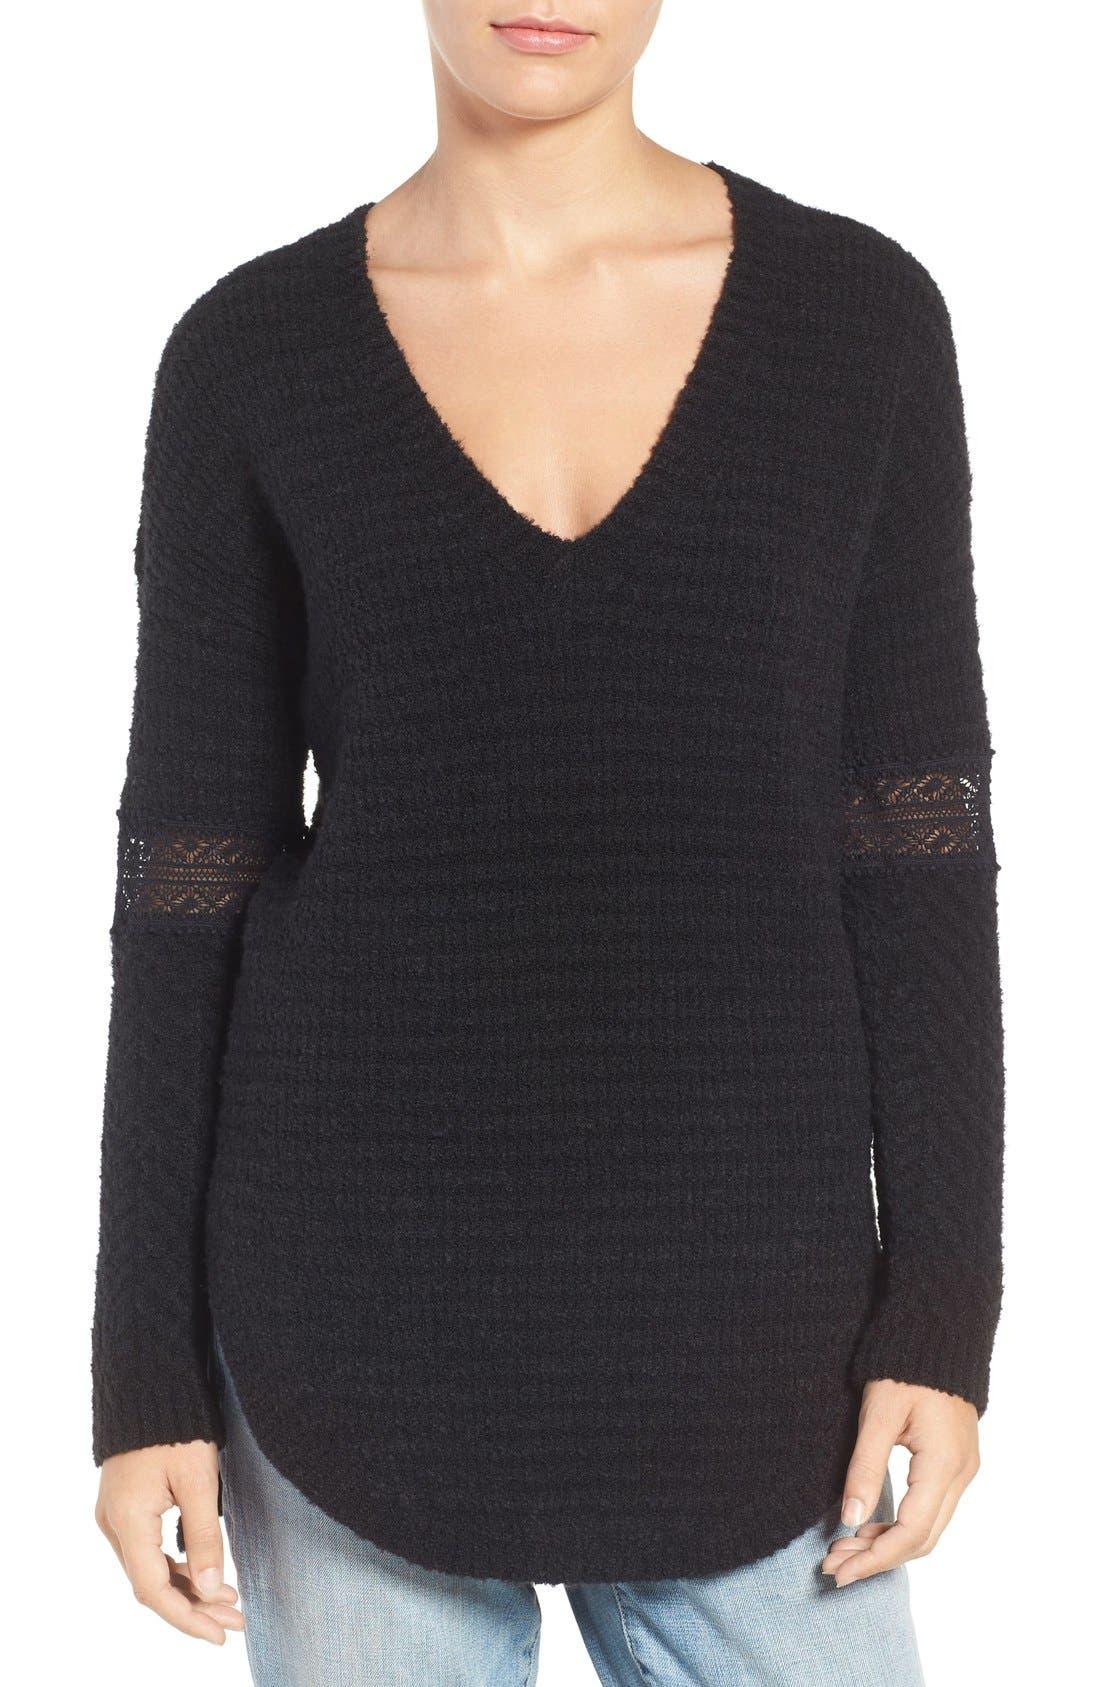 Alternate Image 1 Selected - Hinge Lace Inset V-Neck Sweater